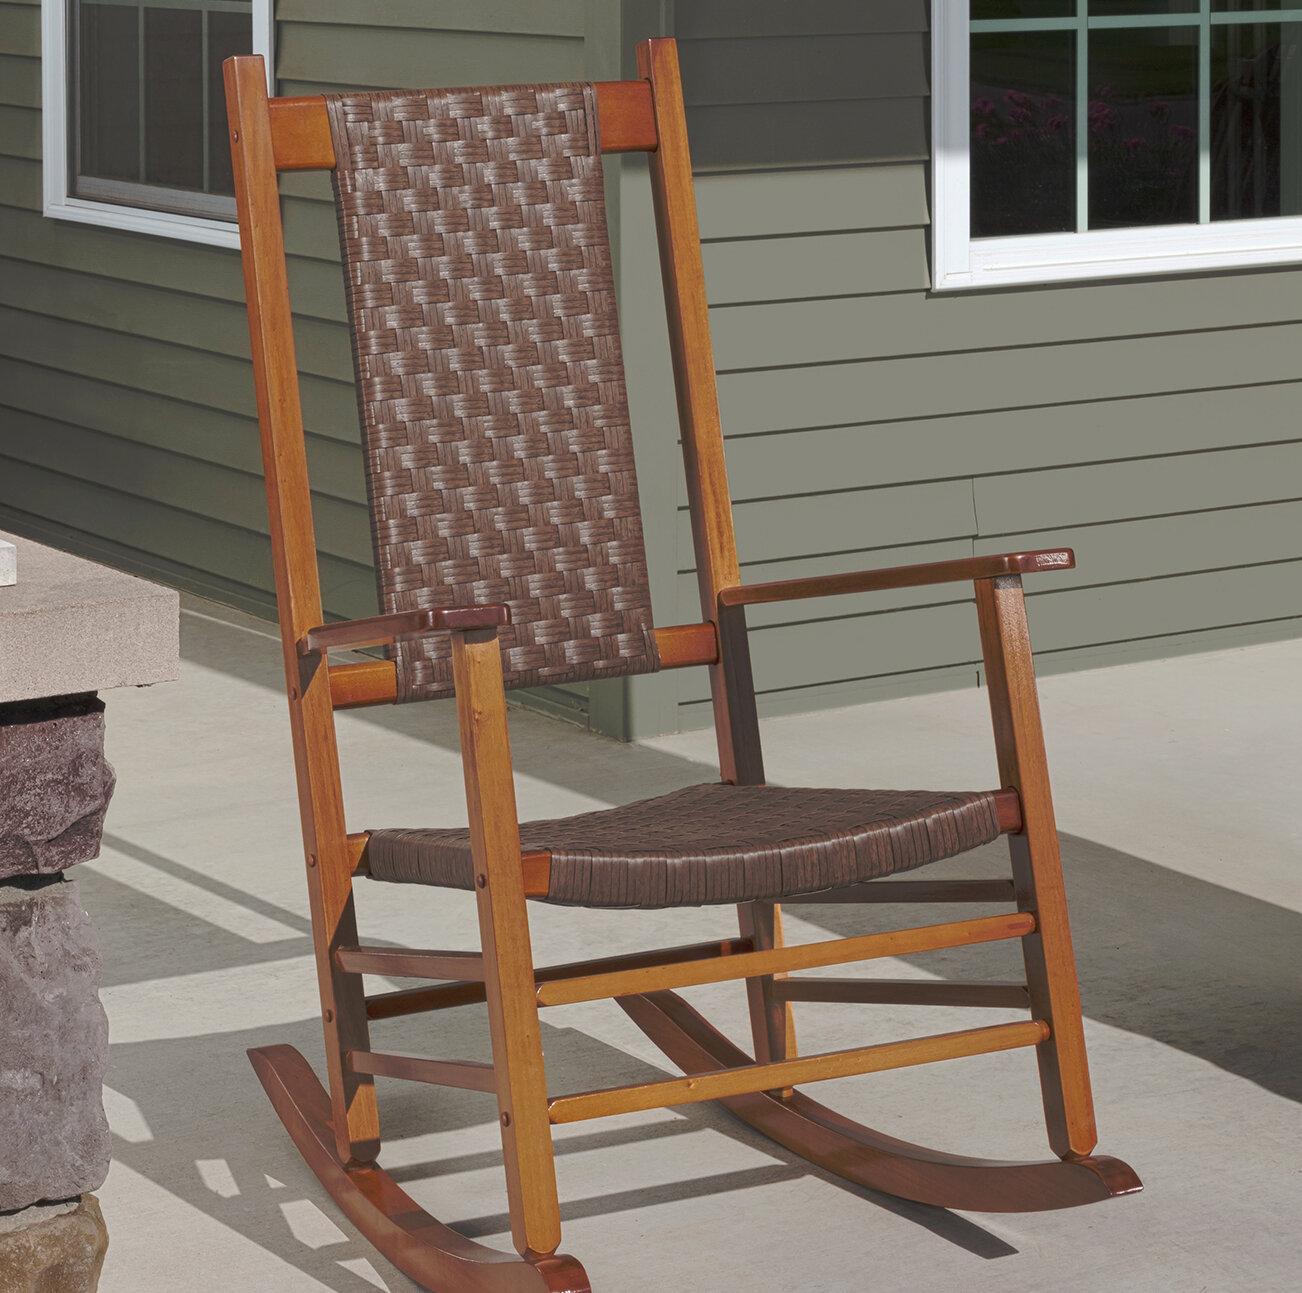 Jack Post Knollwood Wicker Rocking Chair Reviews Wayfair